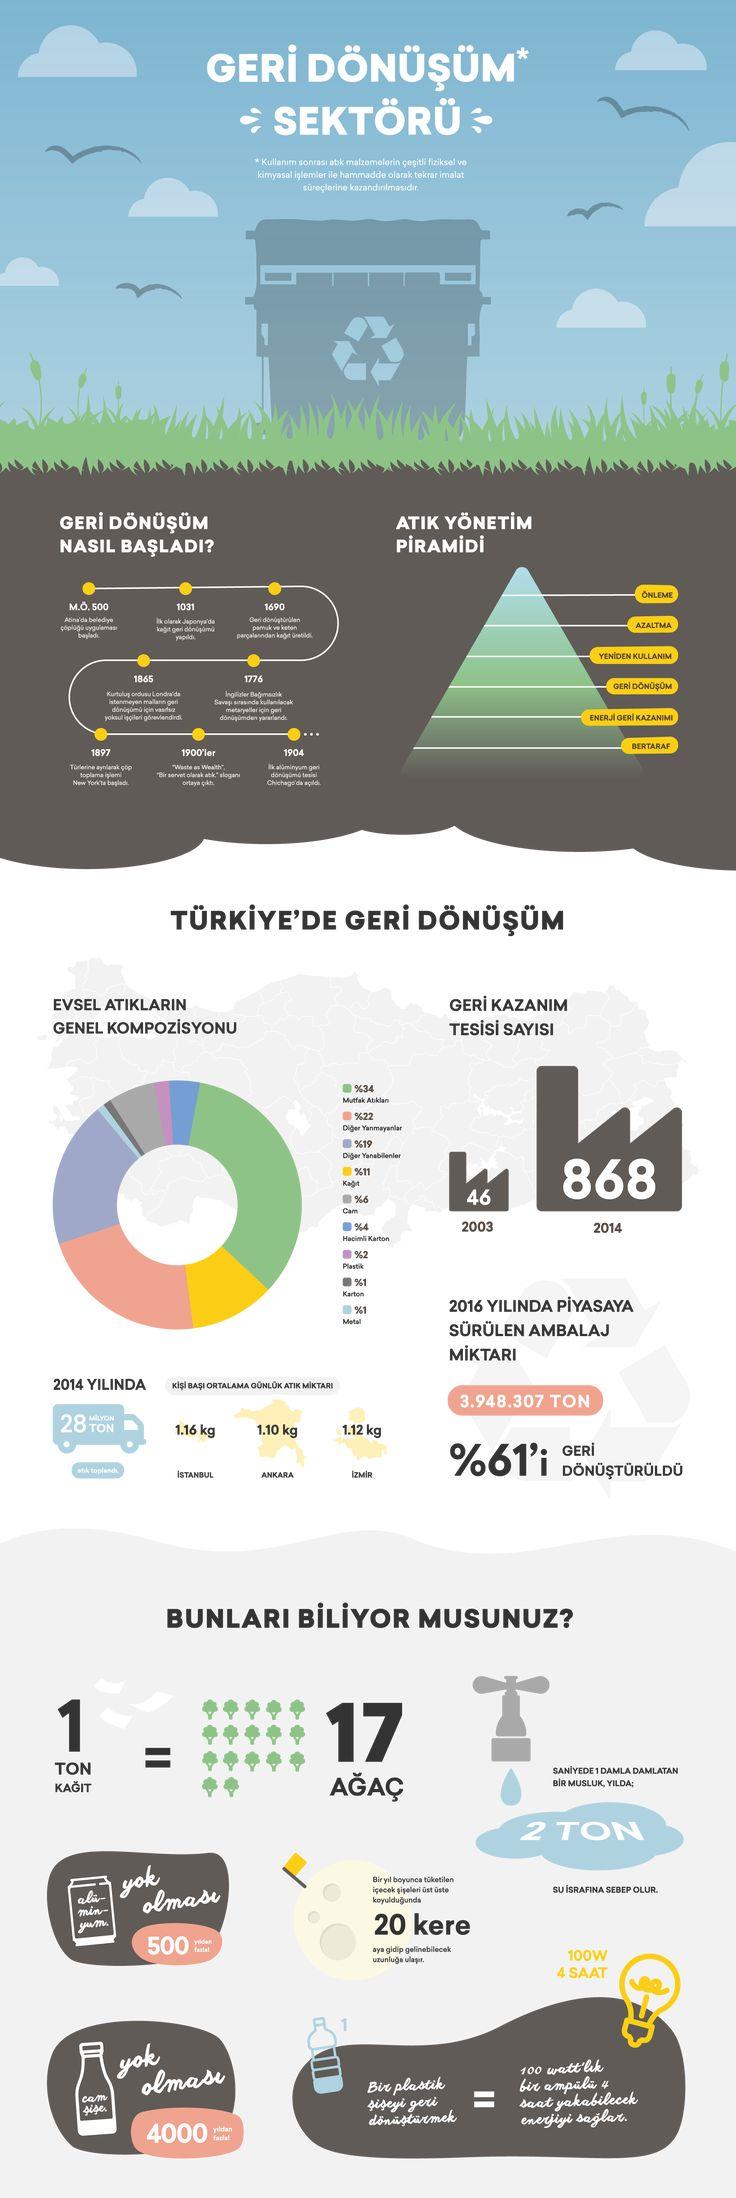 "infographic about recycling Check out this @Behance project: ""İnfografik: Geri Dönüşüm"" https://www.behance.net/gallery/58496423/nfografik-Geri-Doenuesuem"